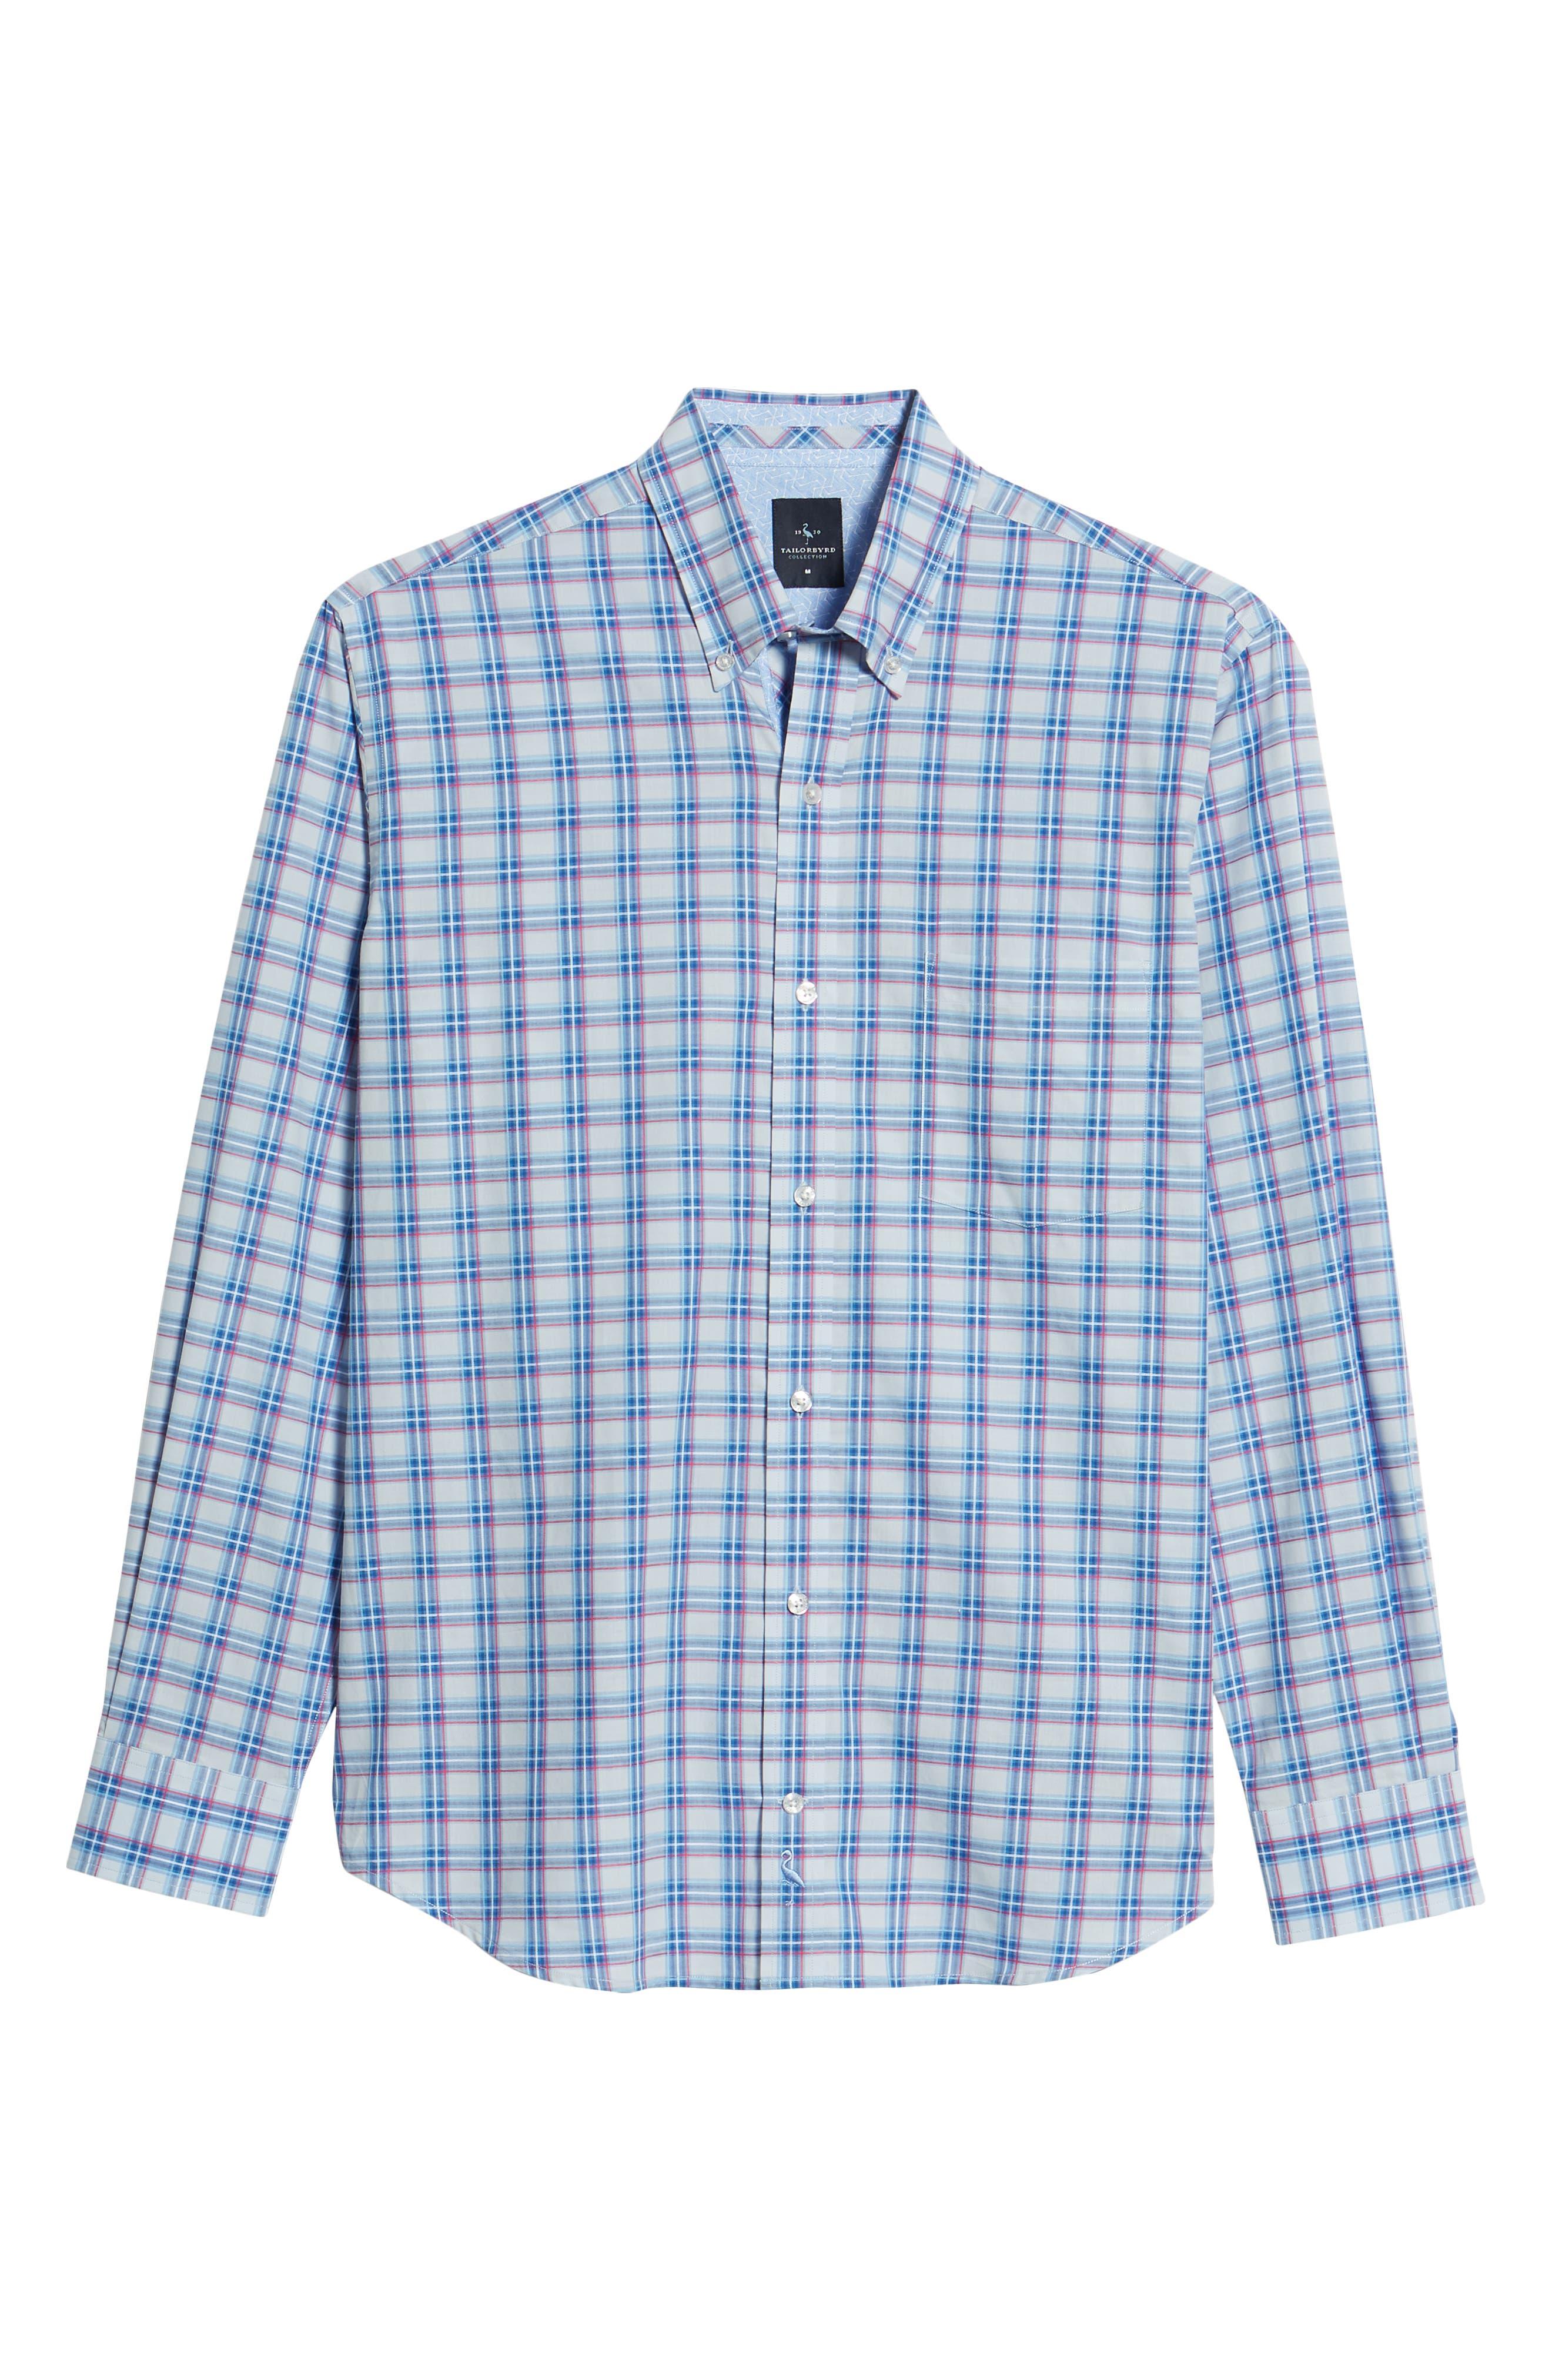 Alvaro Regular Fit Plaid Sport Shirt,                             Alternate thumbnail 6, color,                             450